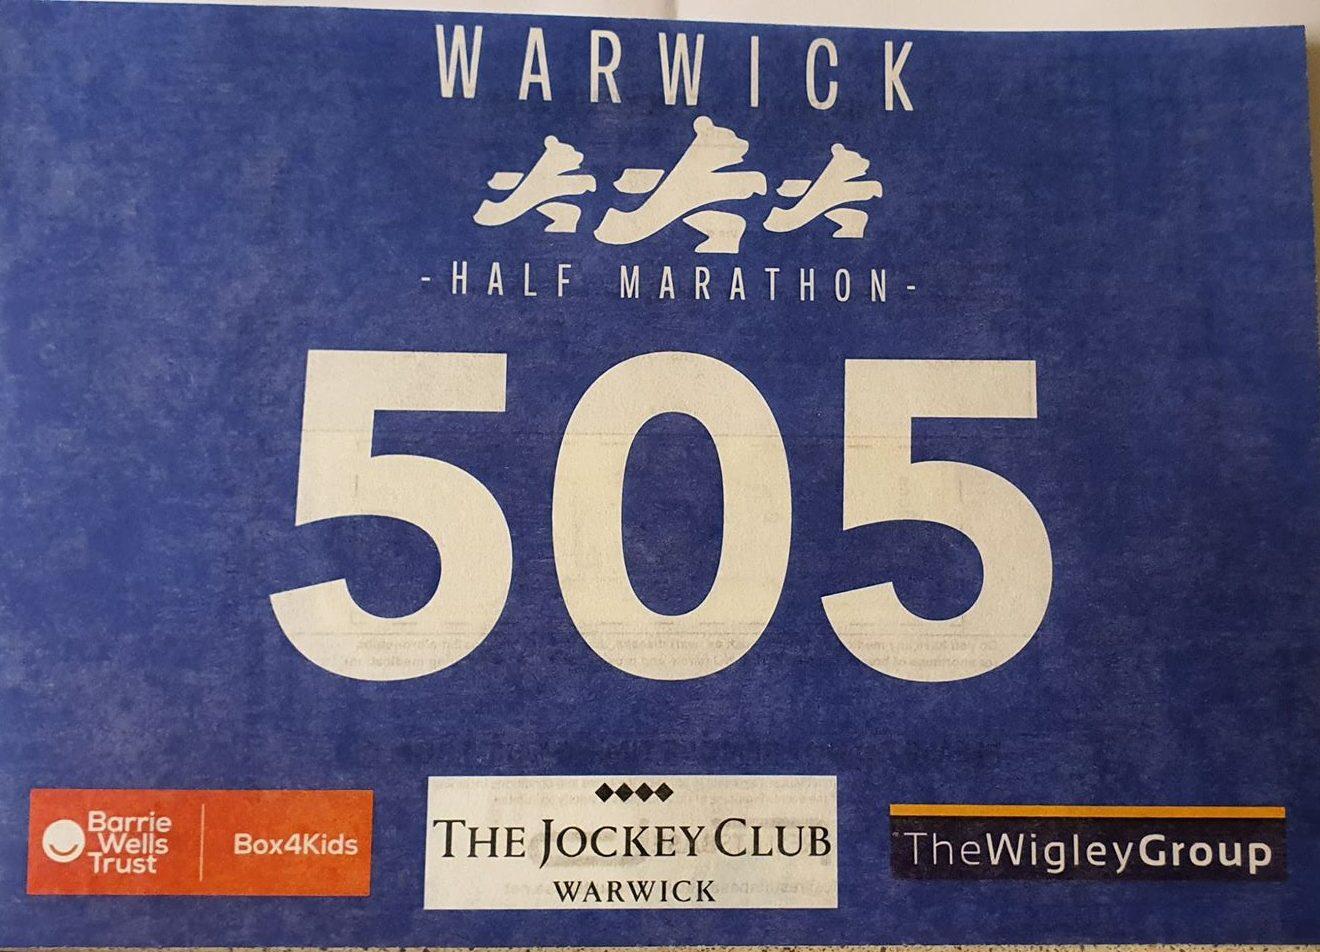 Warwick Half Marathon Race Number